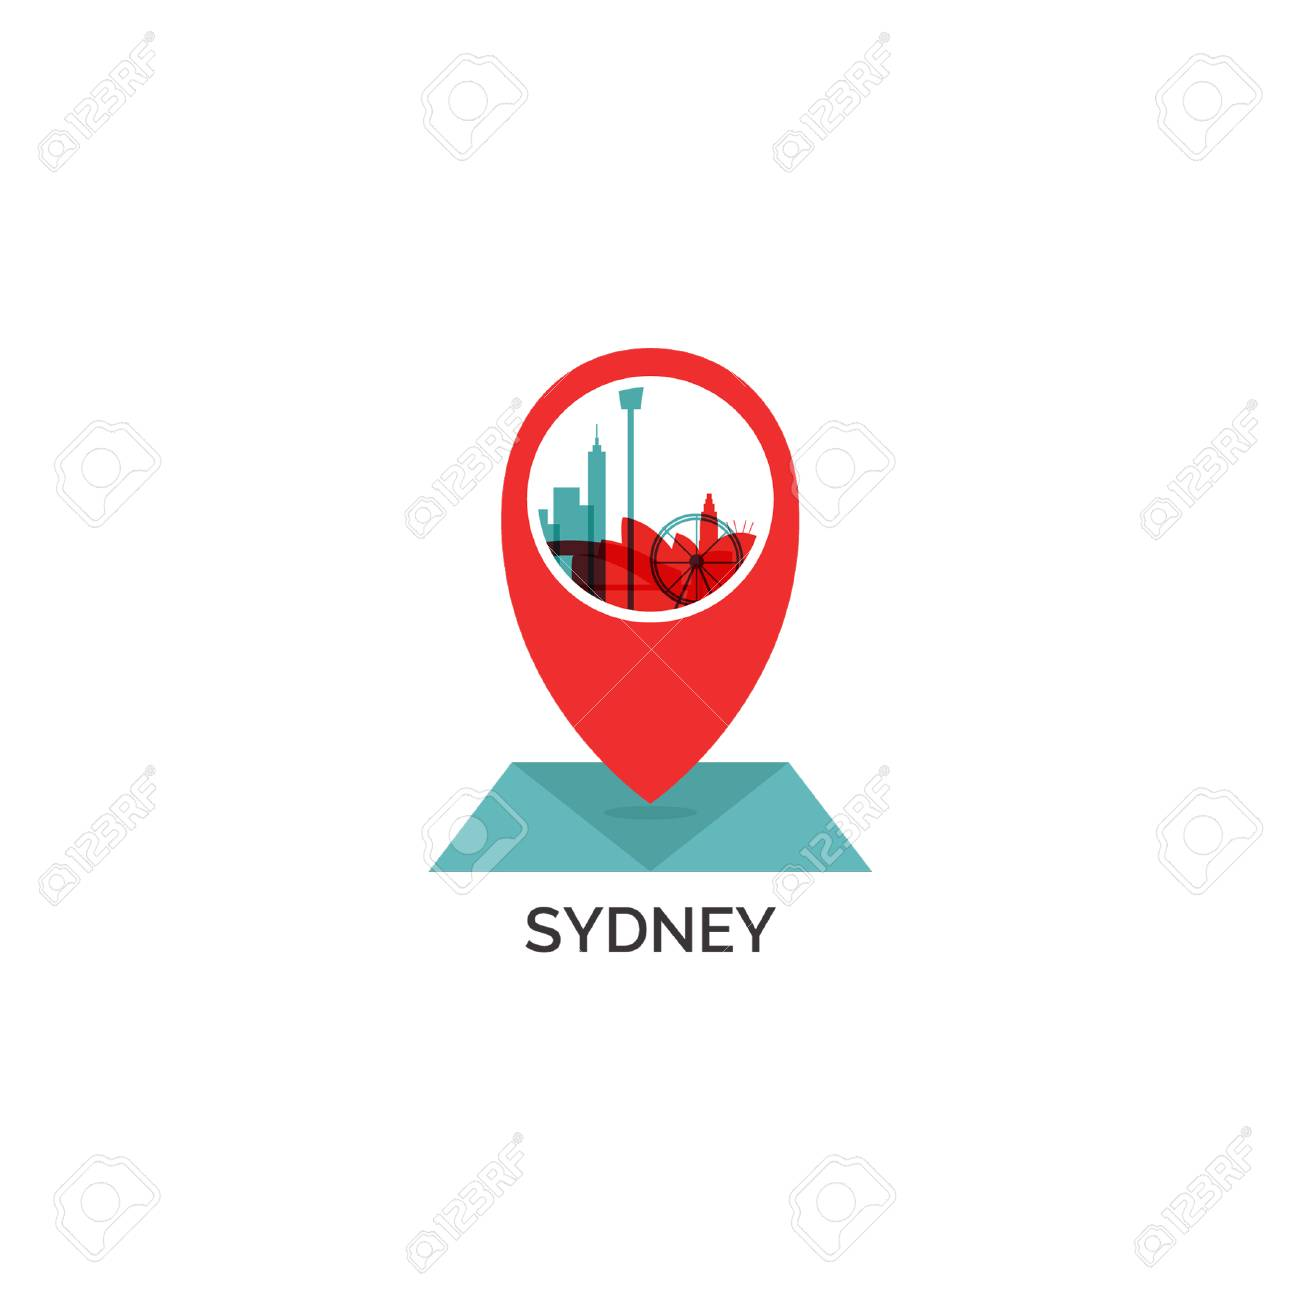 Map Of Australia Logo.Australia Sydney Map City Pin Point Geolocation Modern Skyline